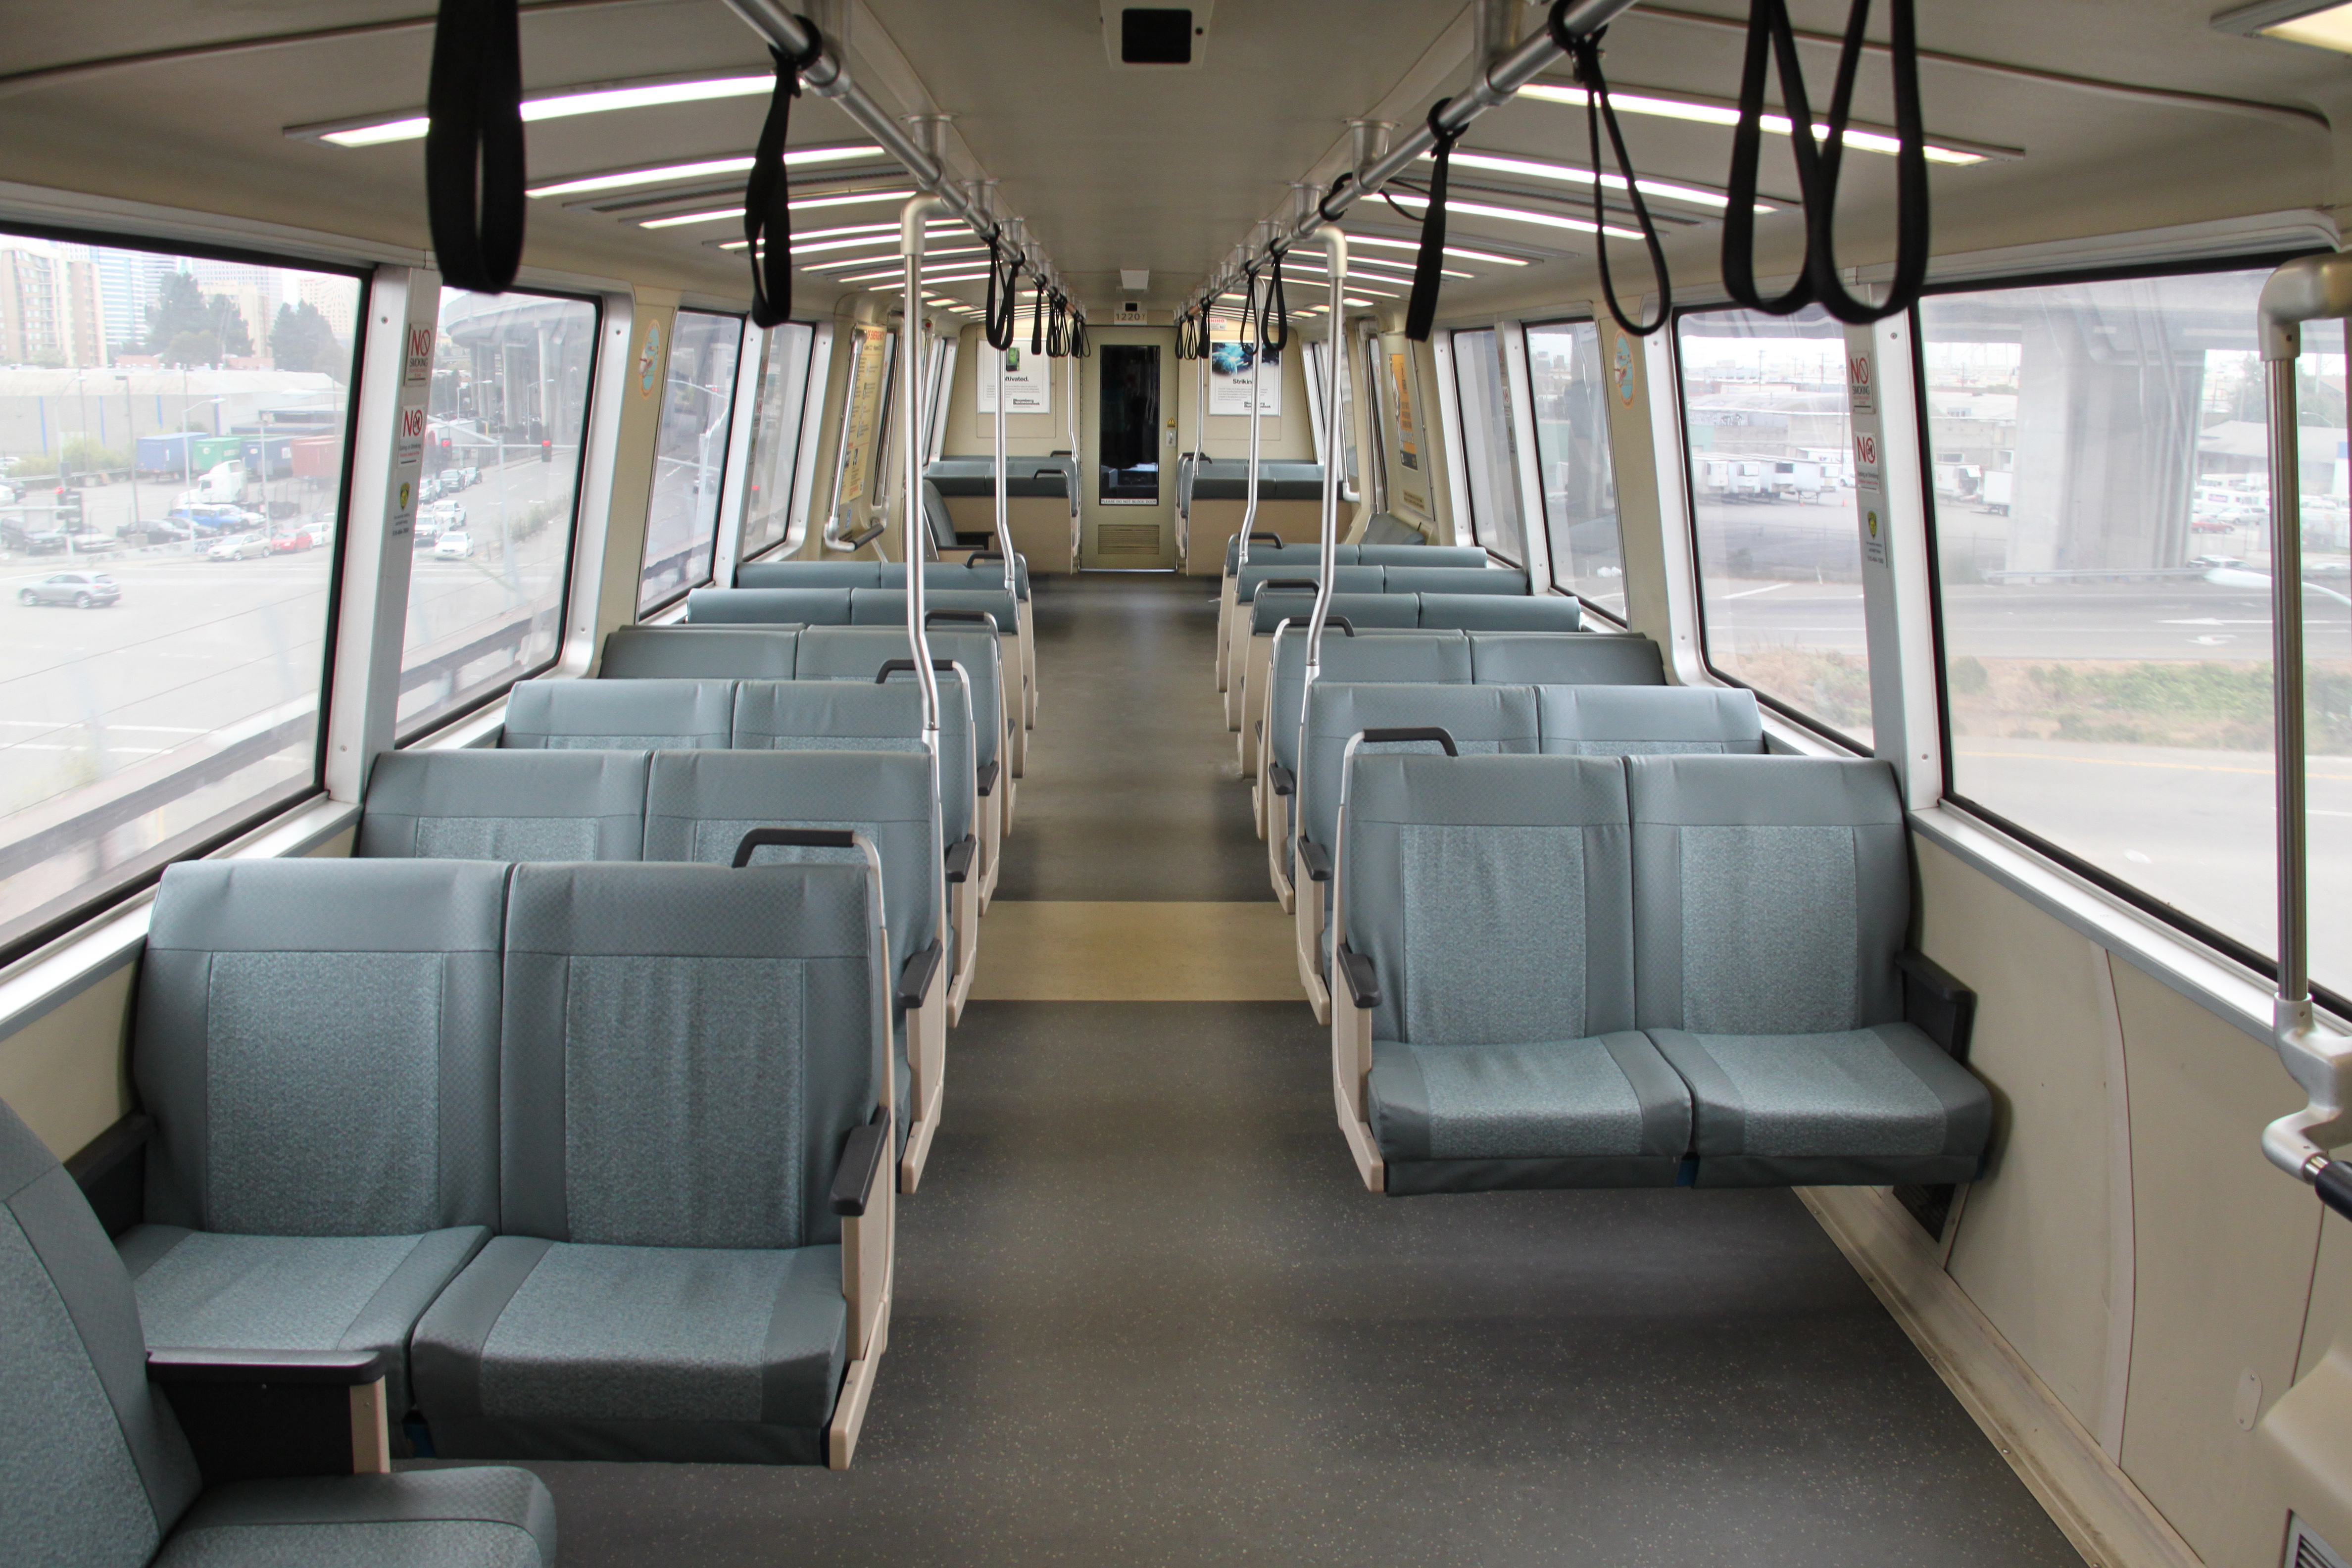 Interior of a BART train. (Maurits90/CC0 1.0)